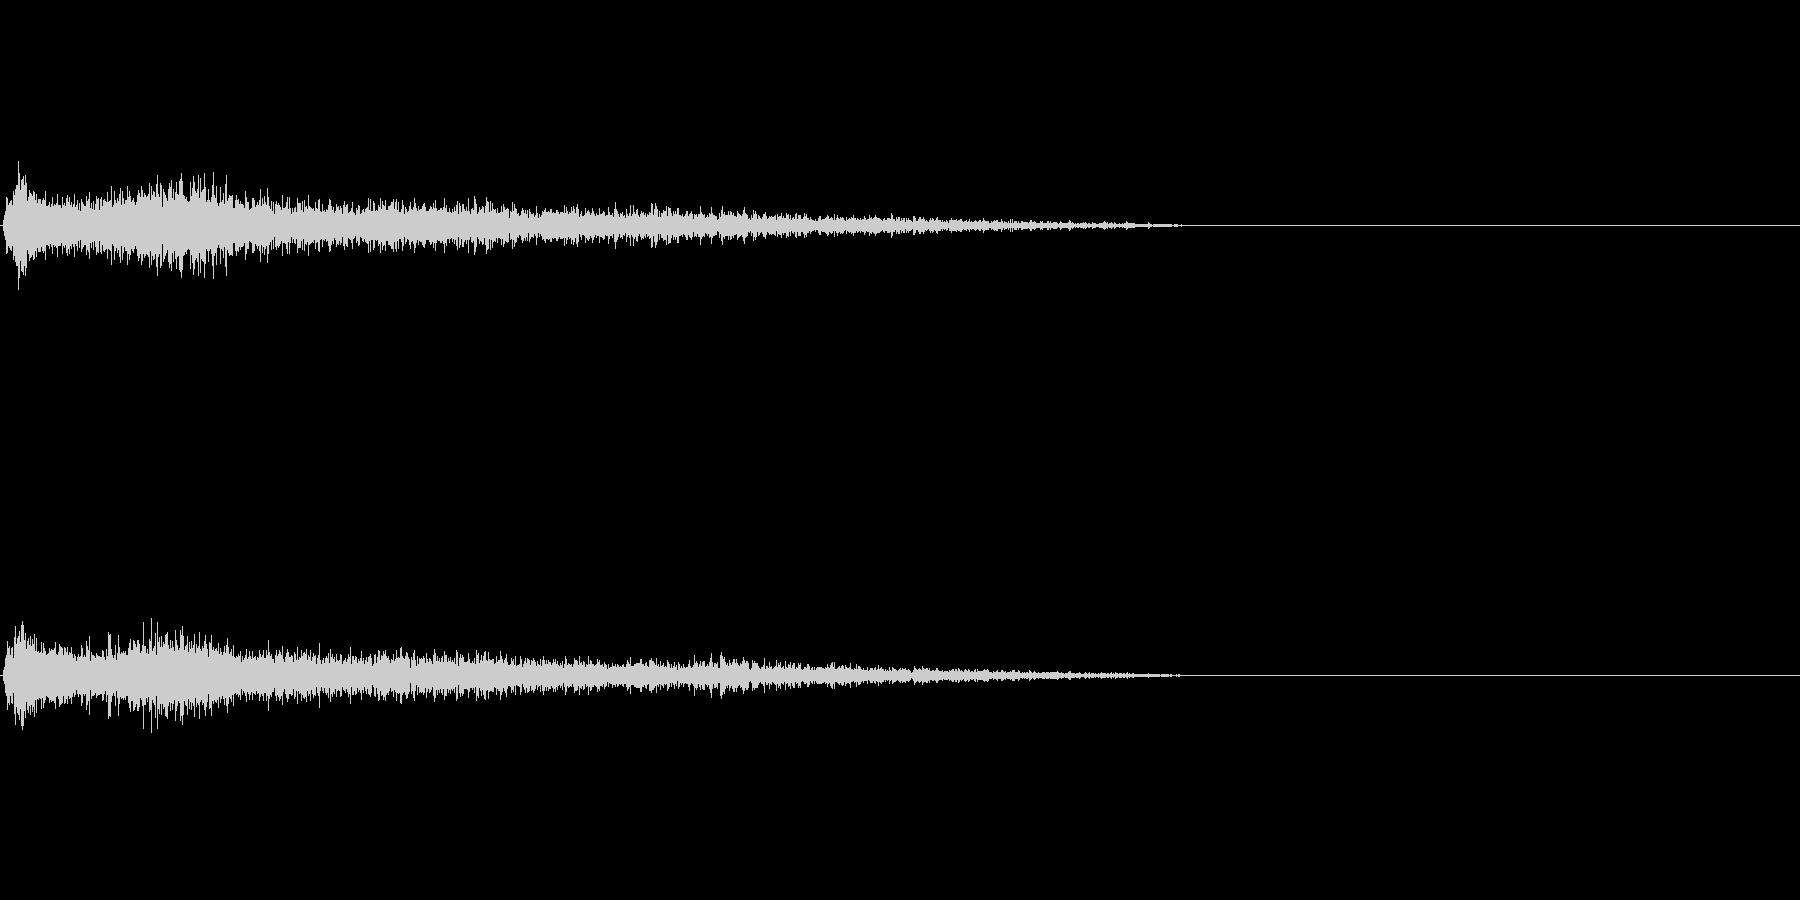 Aマイナー インパクト音 衝撃音の未再生の波形